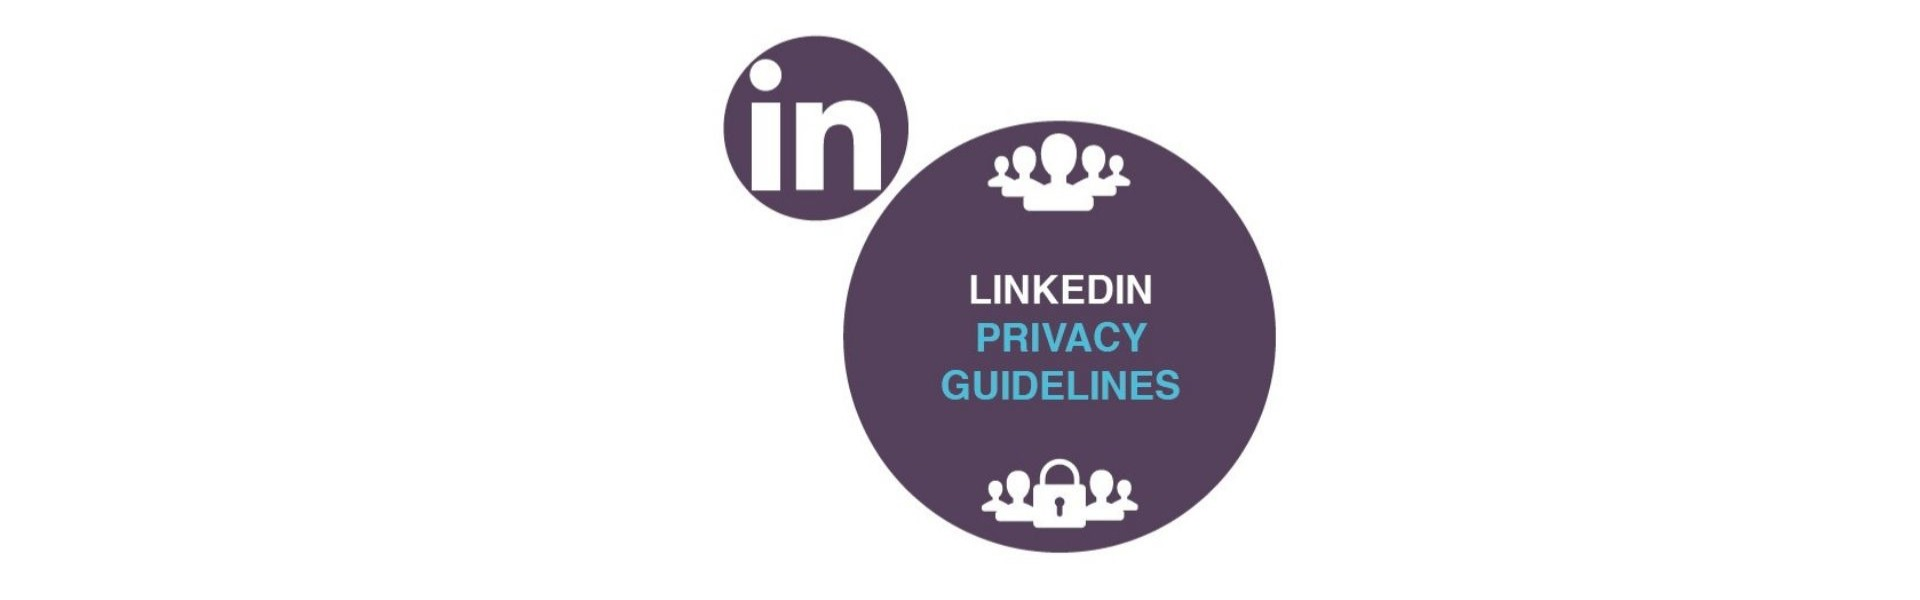 LinkedIn Privacy Settings Guide